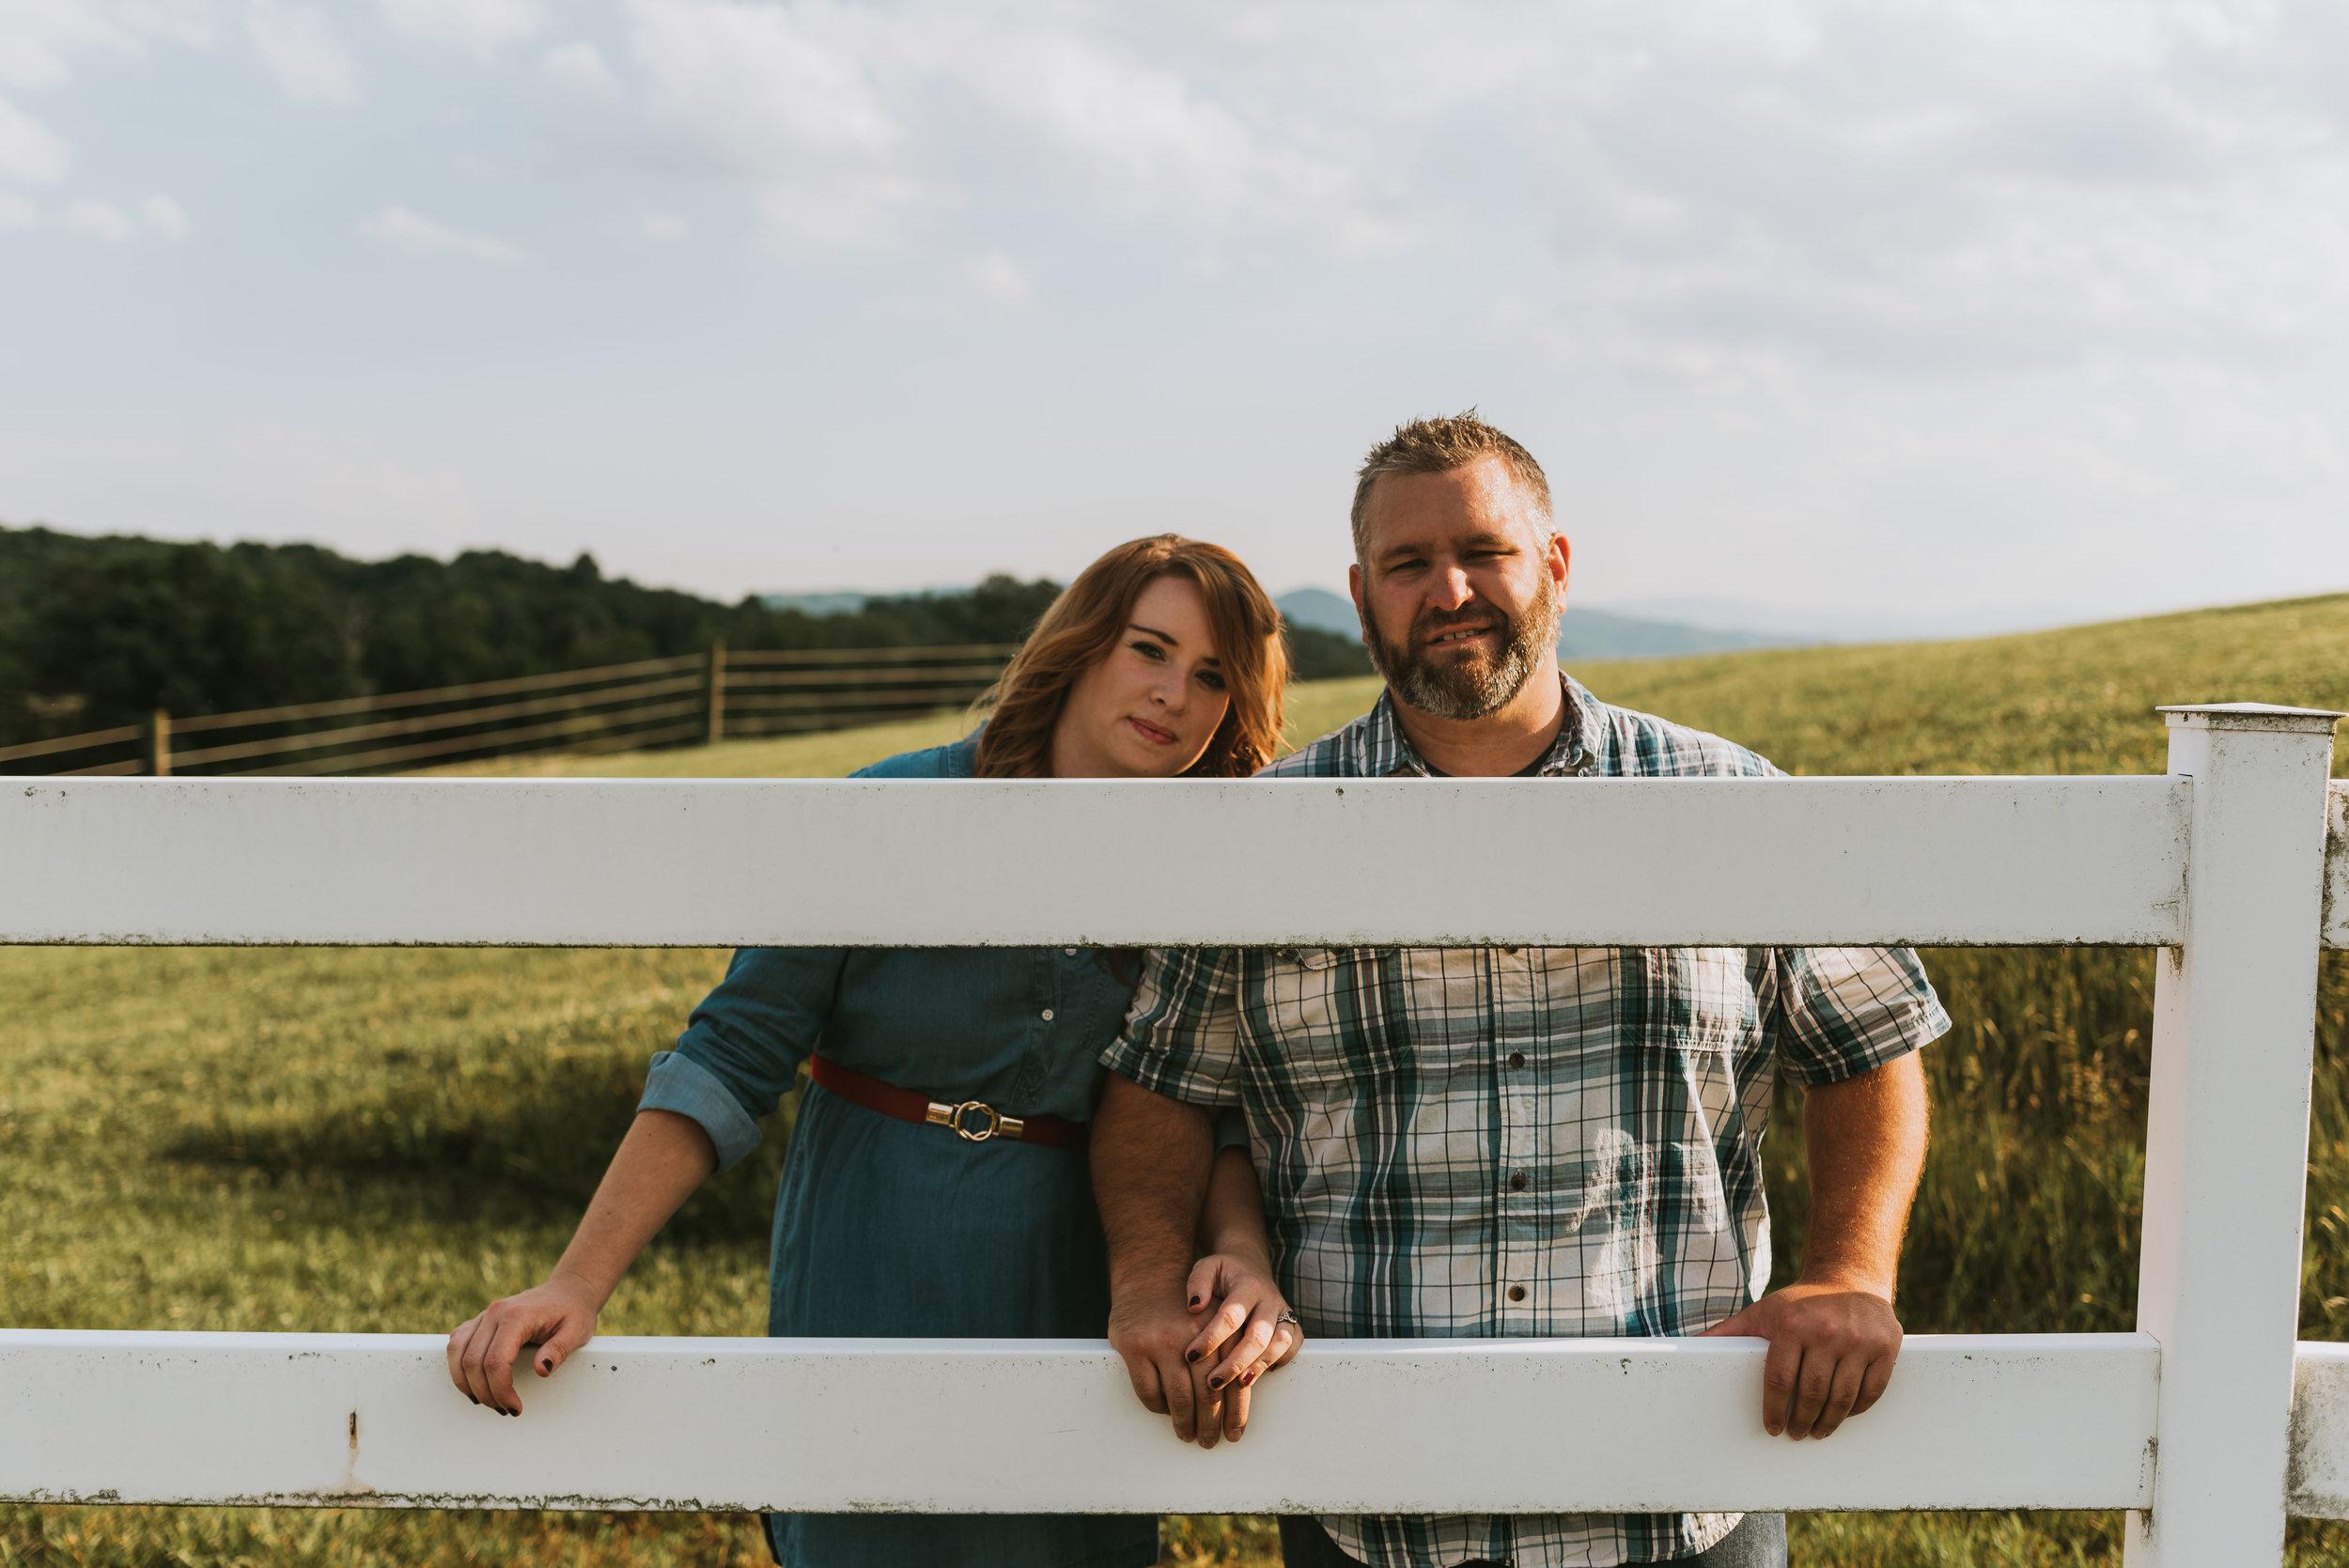 Avalon Farm Wedding in Jonesborough, Tennessee, Northeast Tennessee Wedding Photographer, East Tennessee Wedding Photographer, Knoxville, TN Wedding Photographer